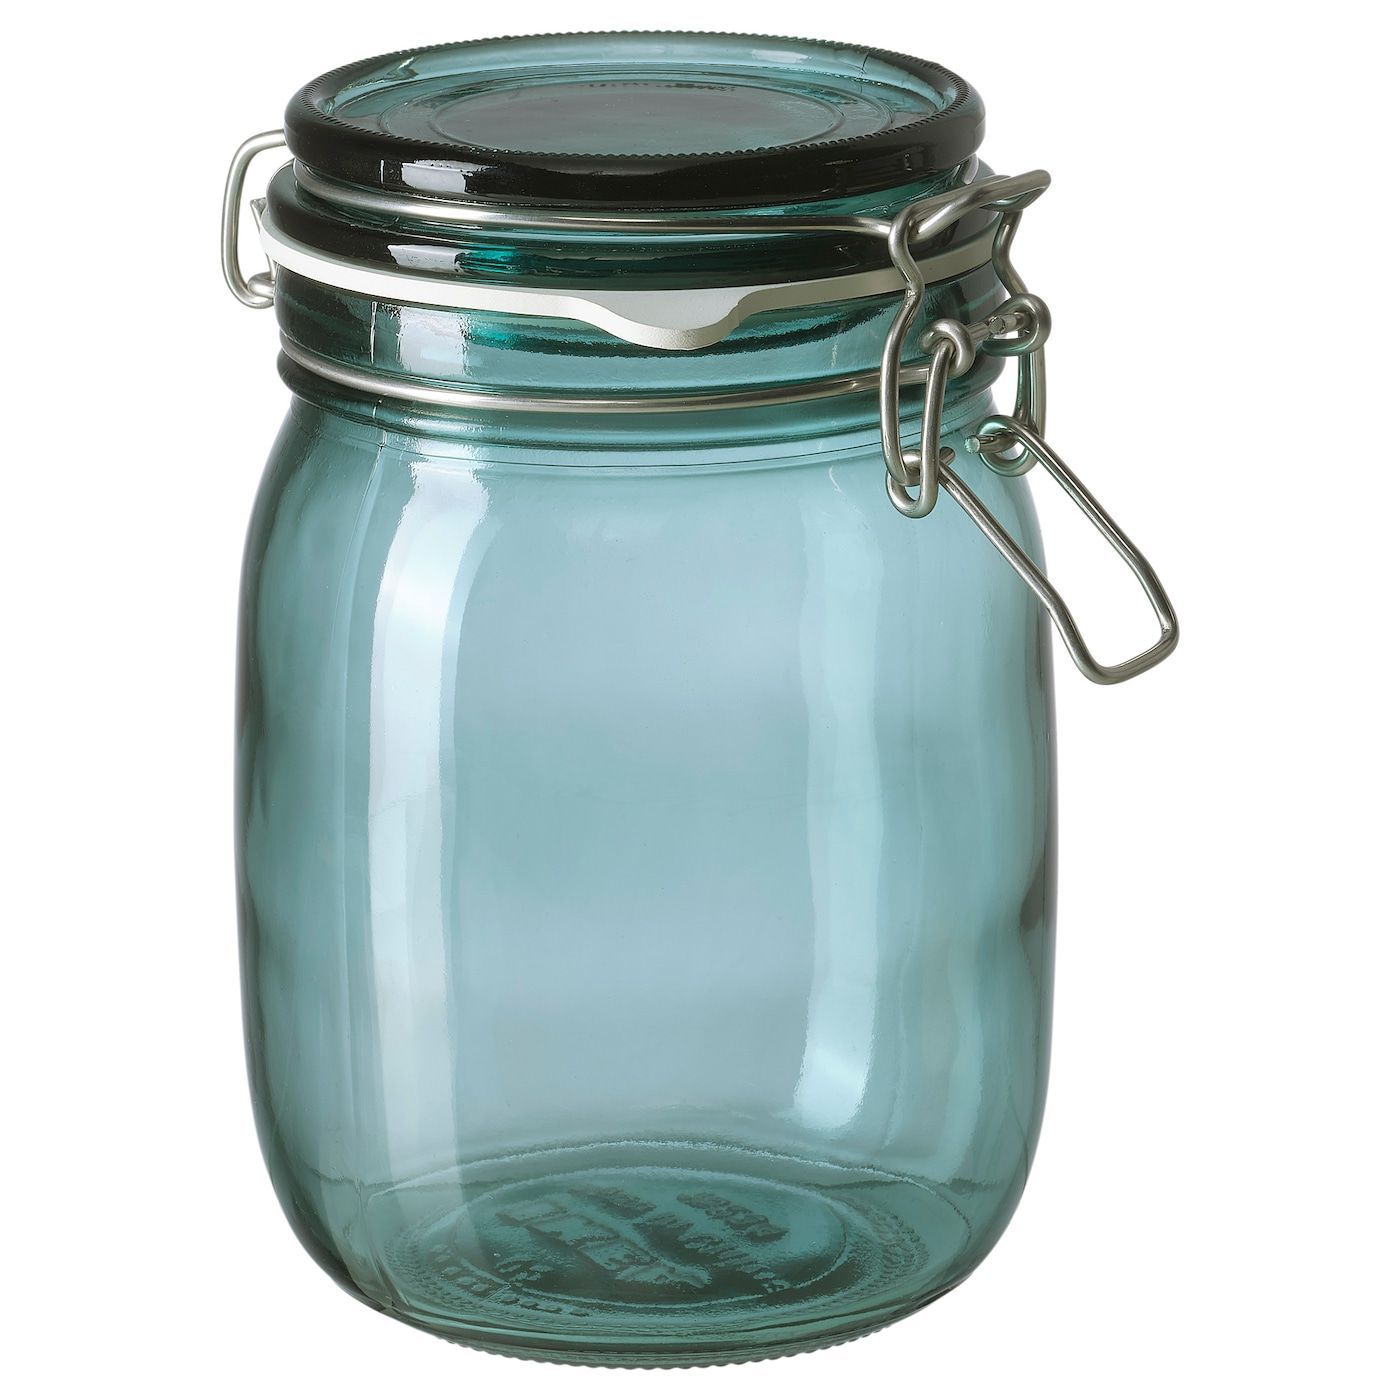 Korken Jar With Lid Green 1 L 34 Oz In 2020 Jar Food Storage Organization Food Storage